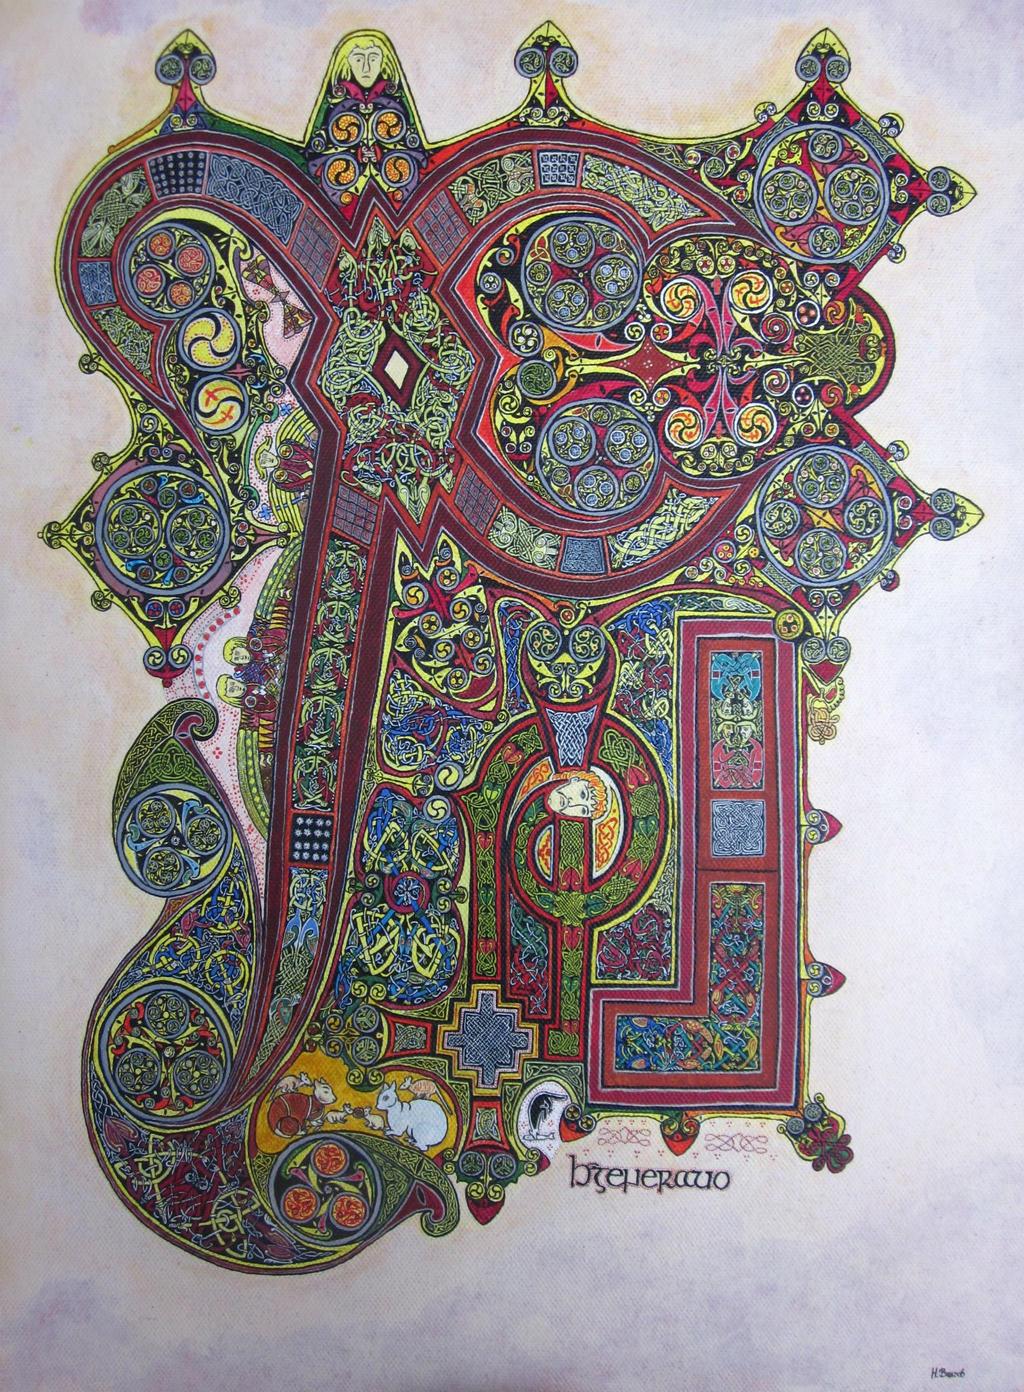 Book Of Kells Folio 34r By Nikeyvv On Deviantart border=